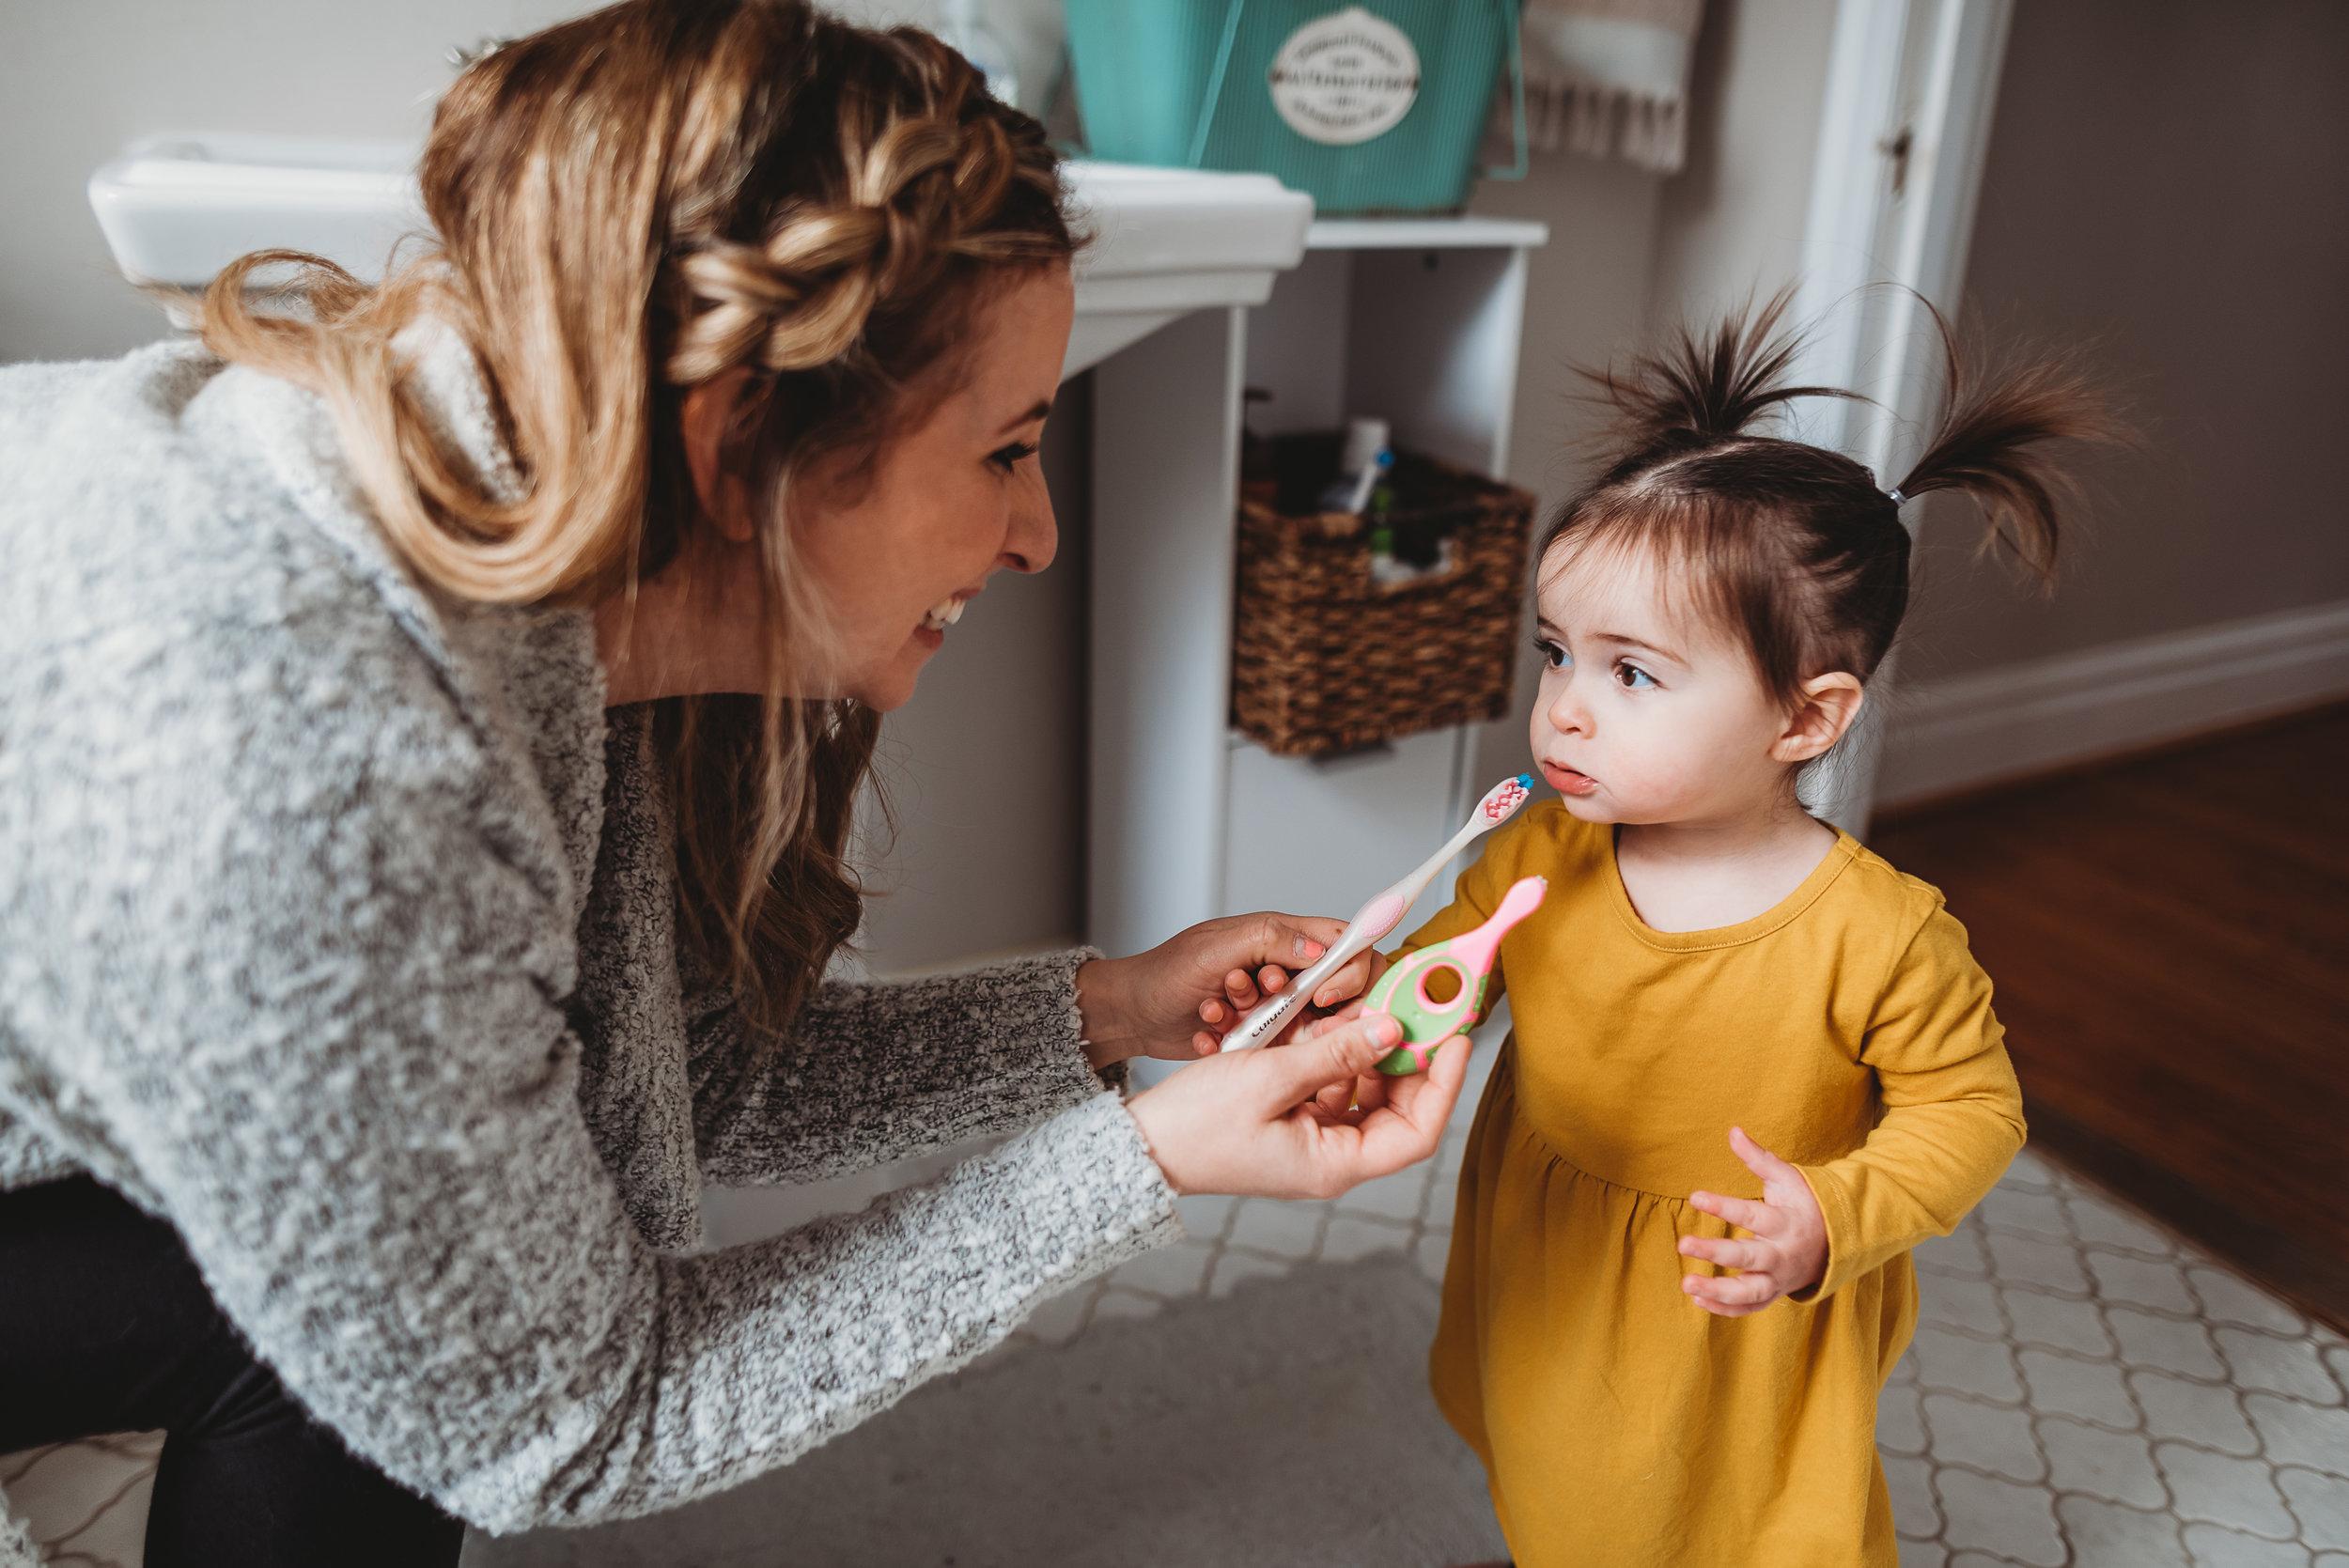 mom and toddler brushing teeth